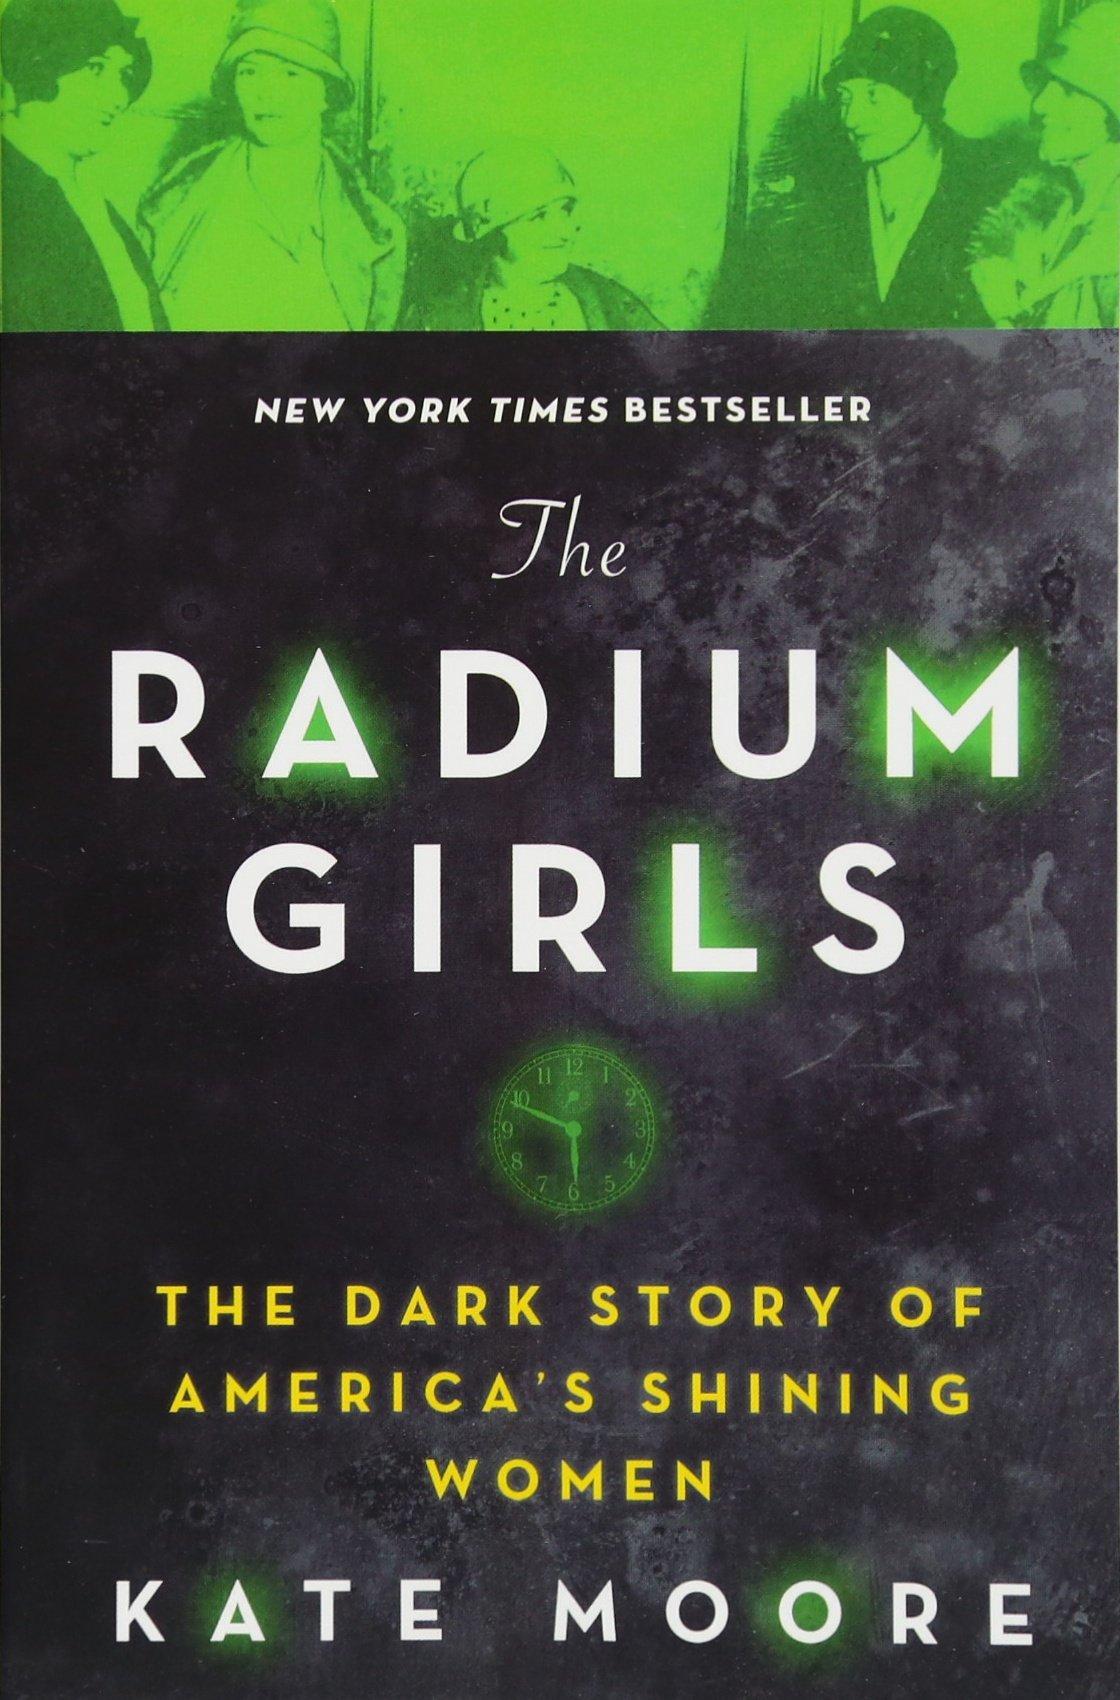 81ffvAPI1eL - The Radium Girls: The Dark Story of America's Shining Women